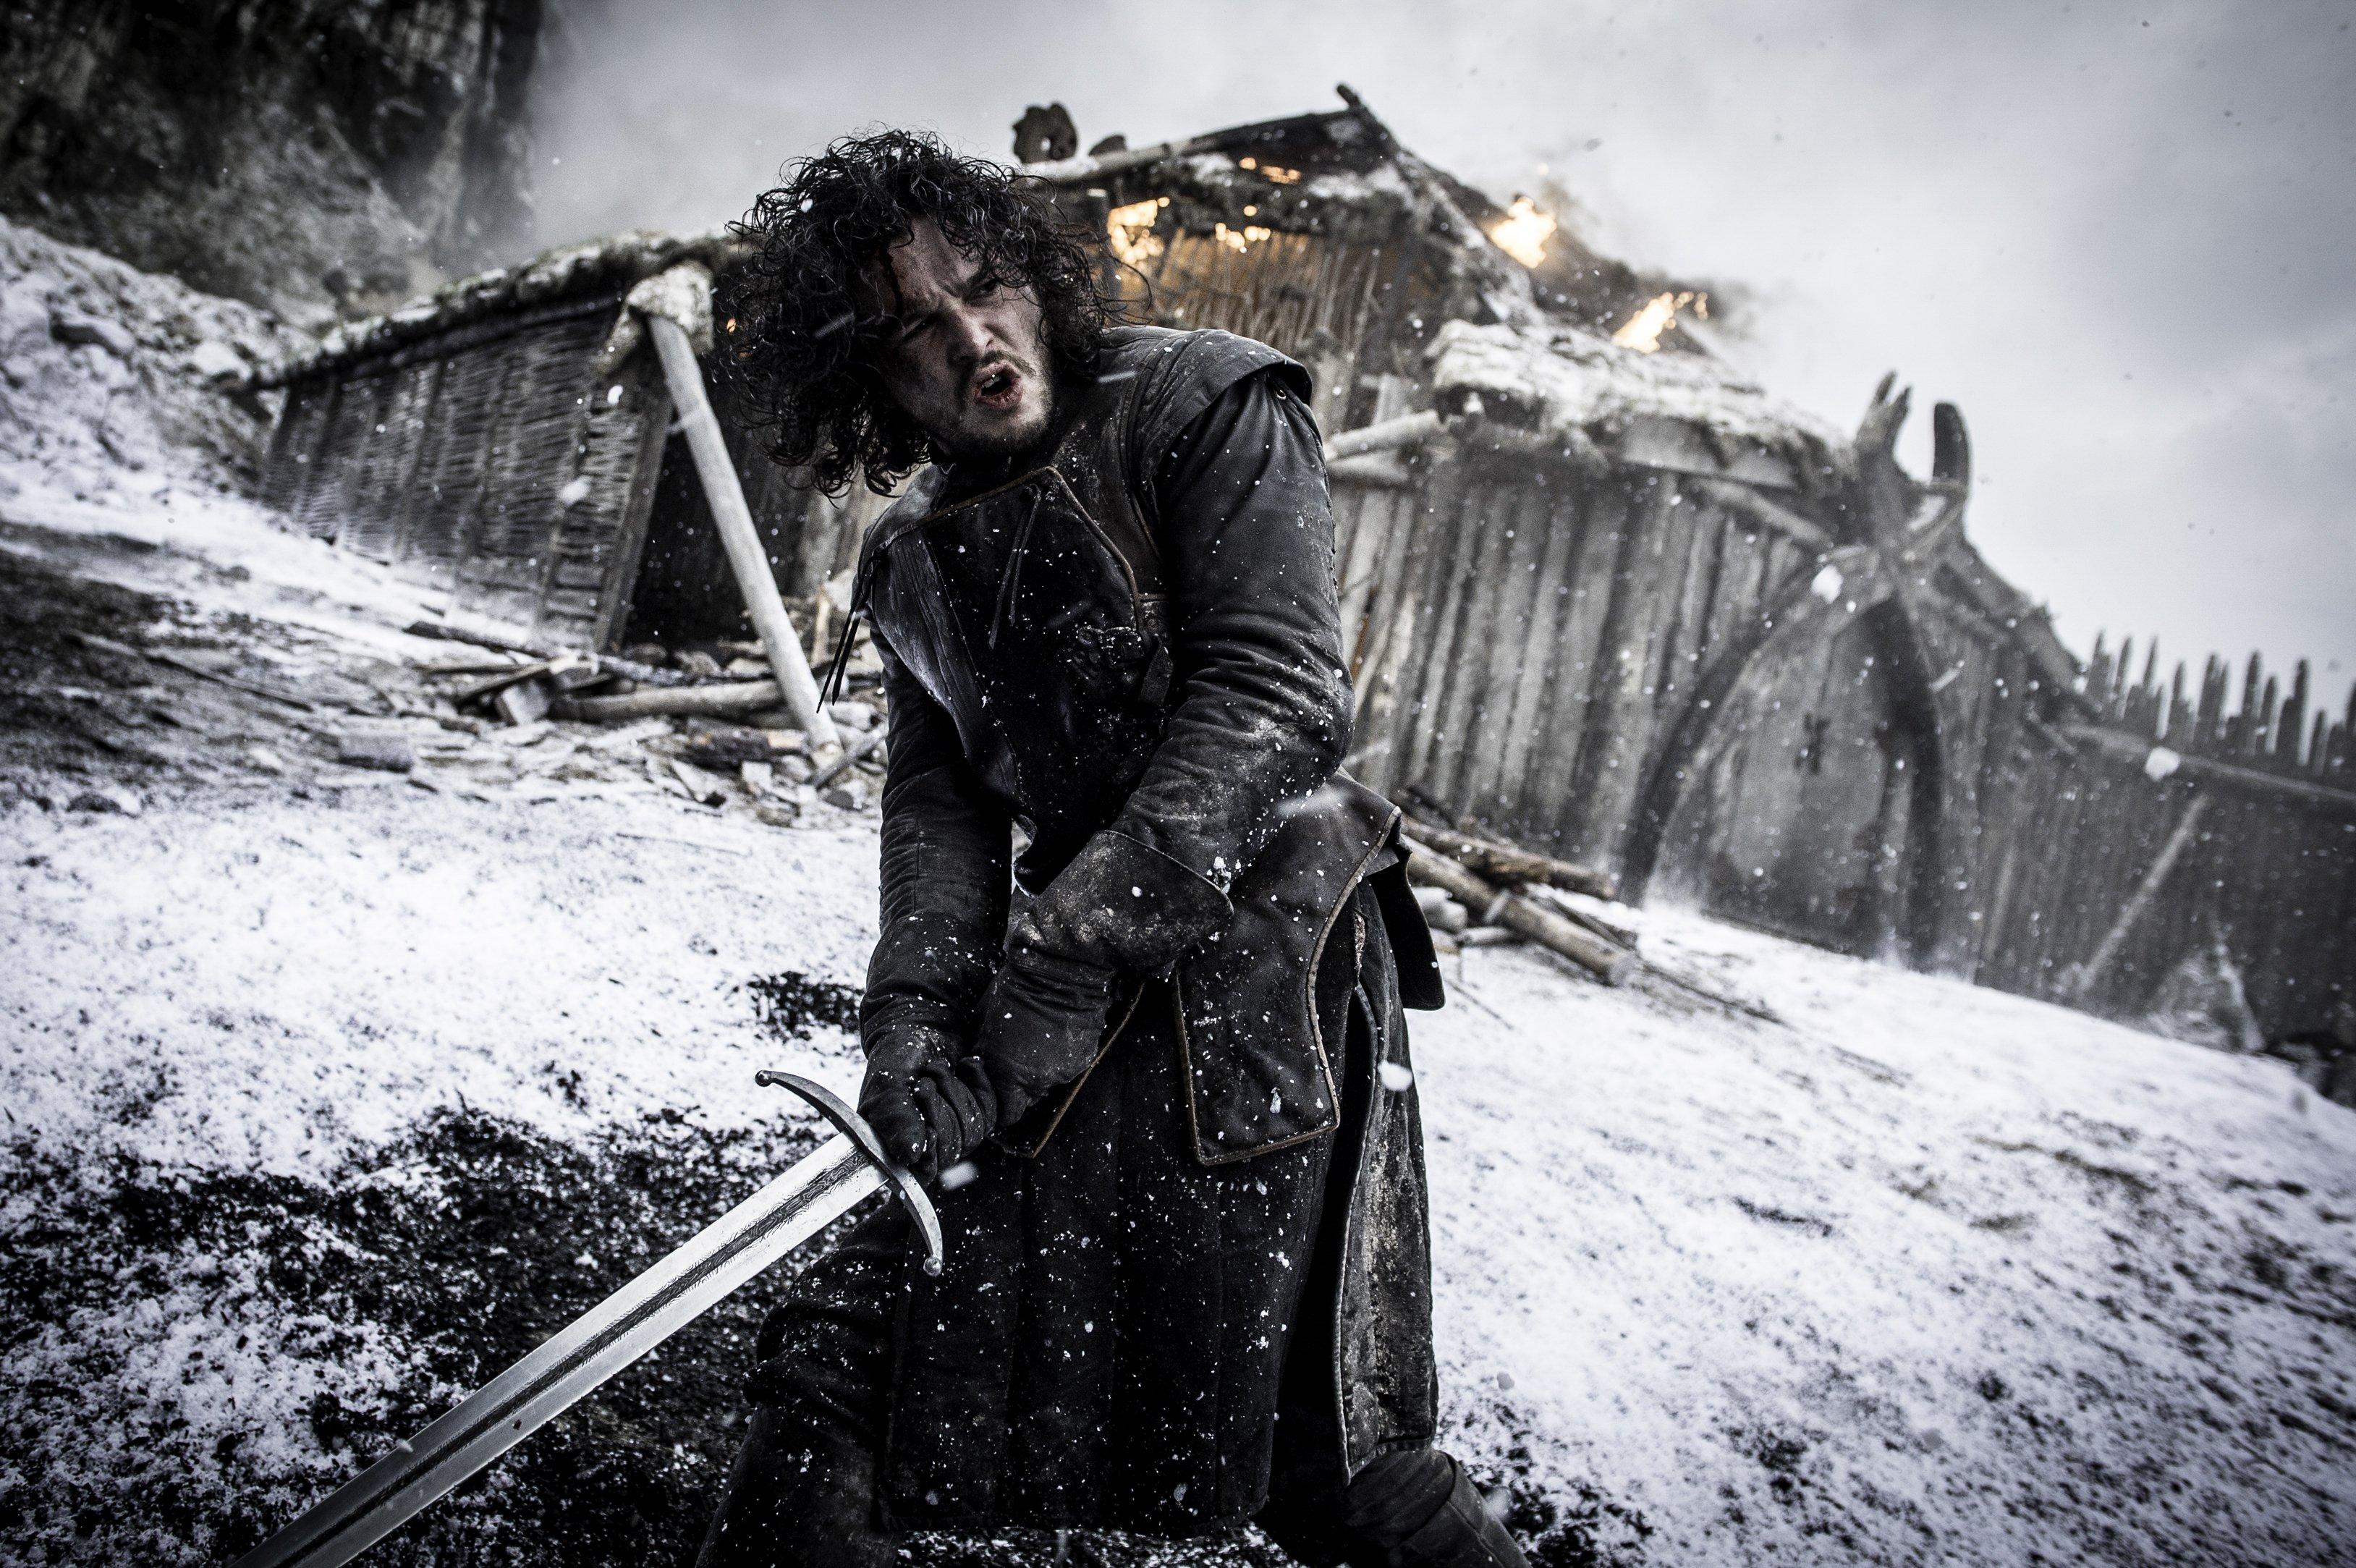 Jon Snow with the Great Sword